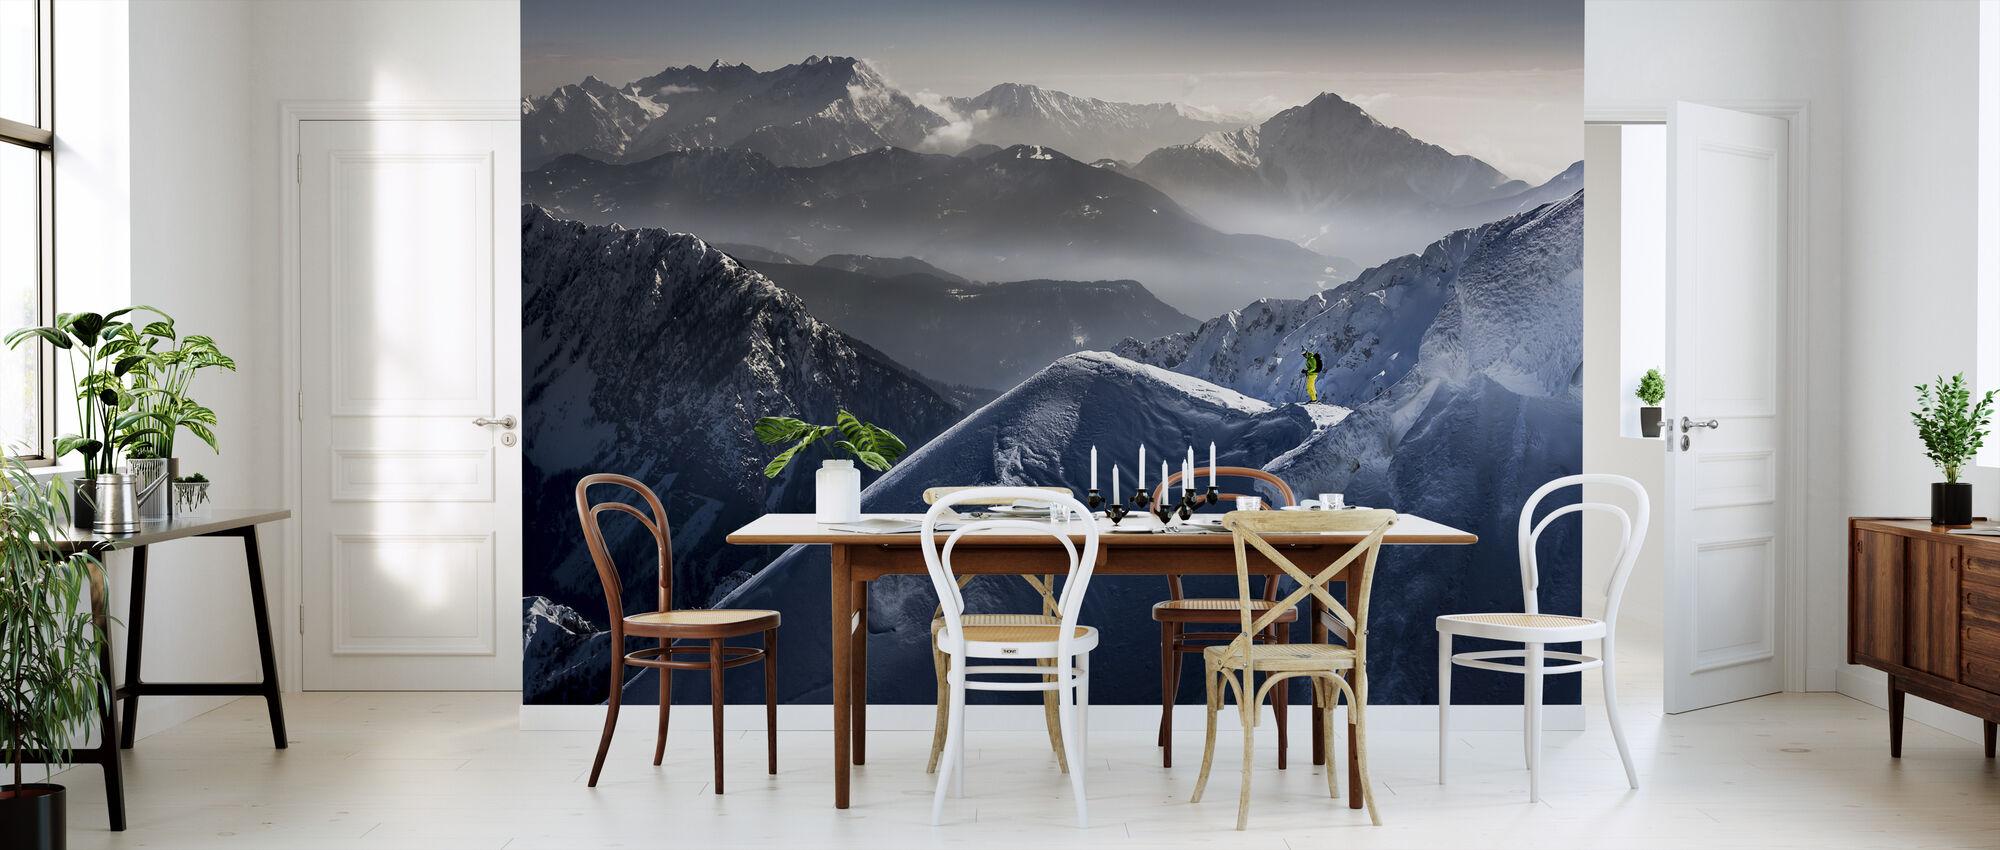 Skier on Mountain Top - Wallpaper - Kitchen